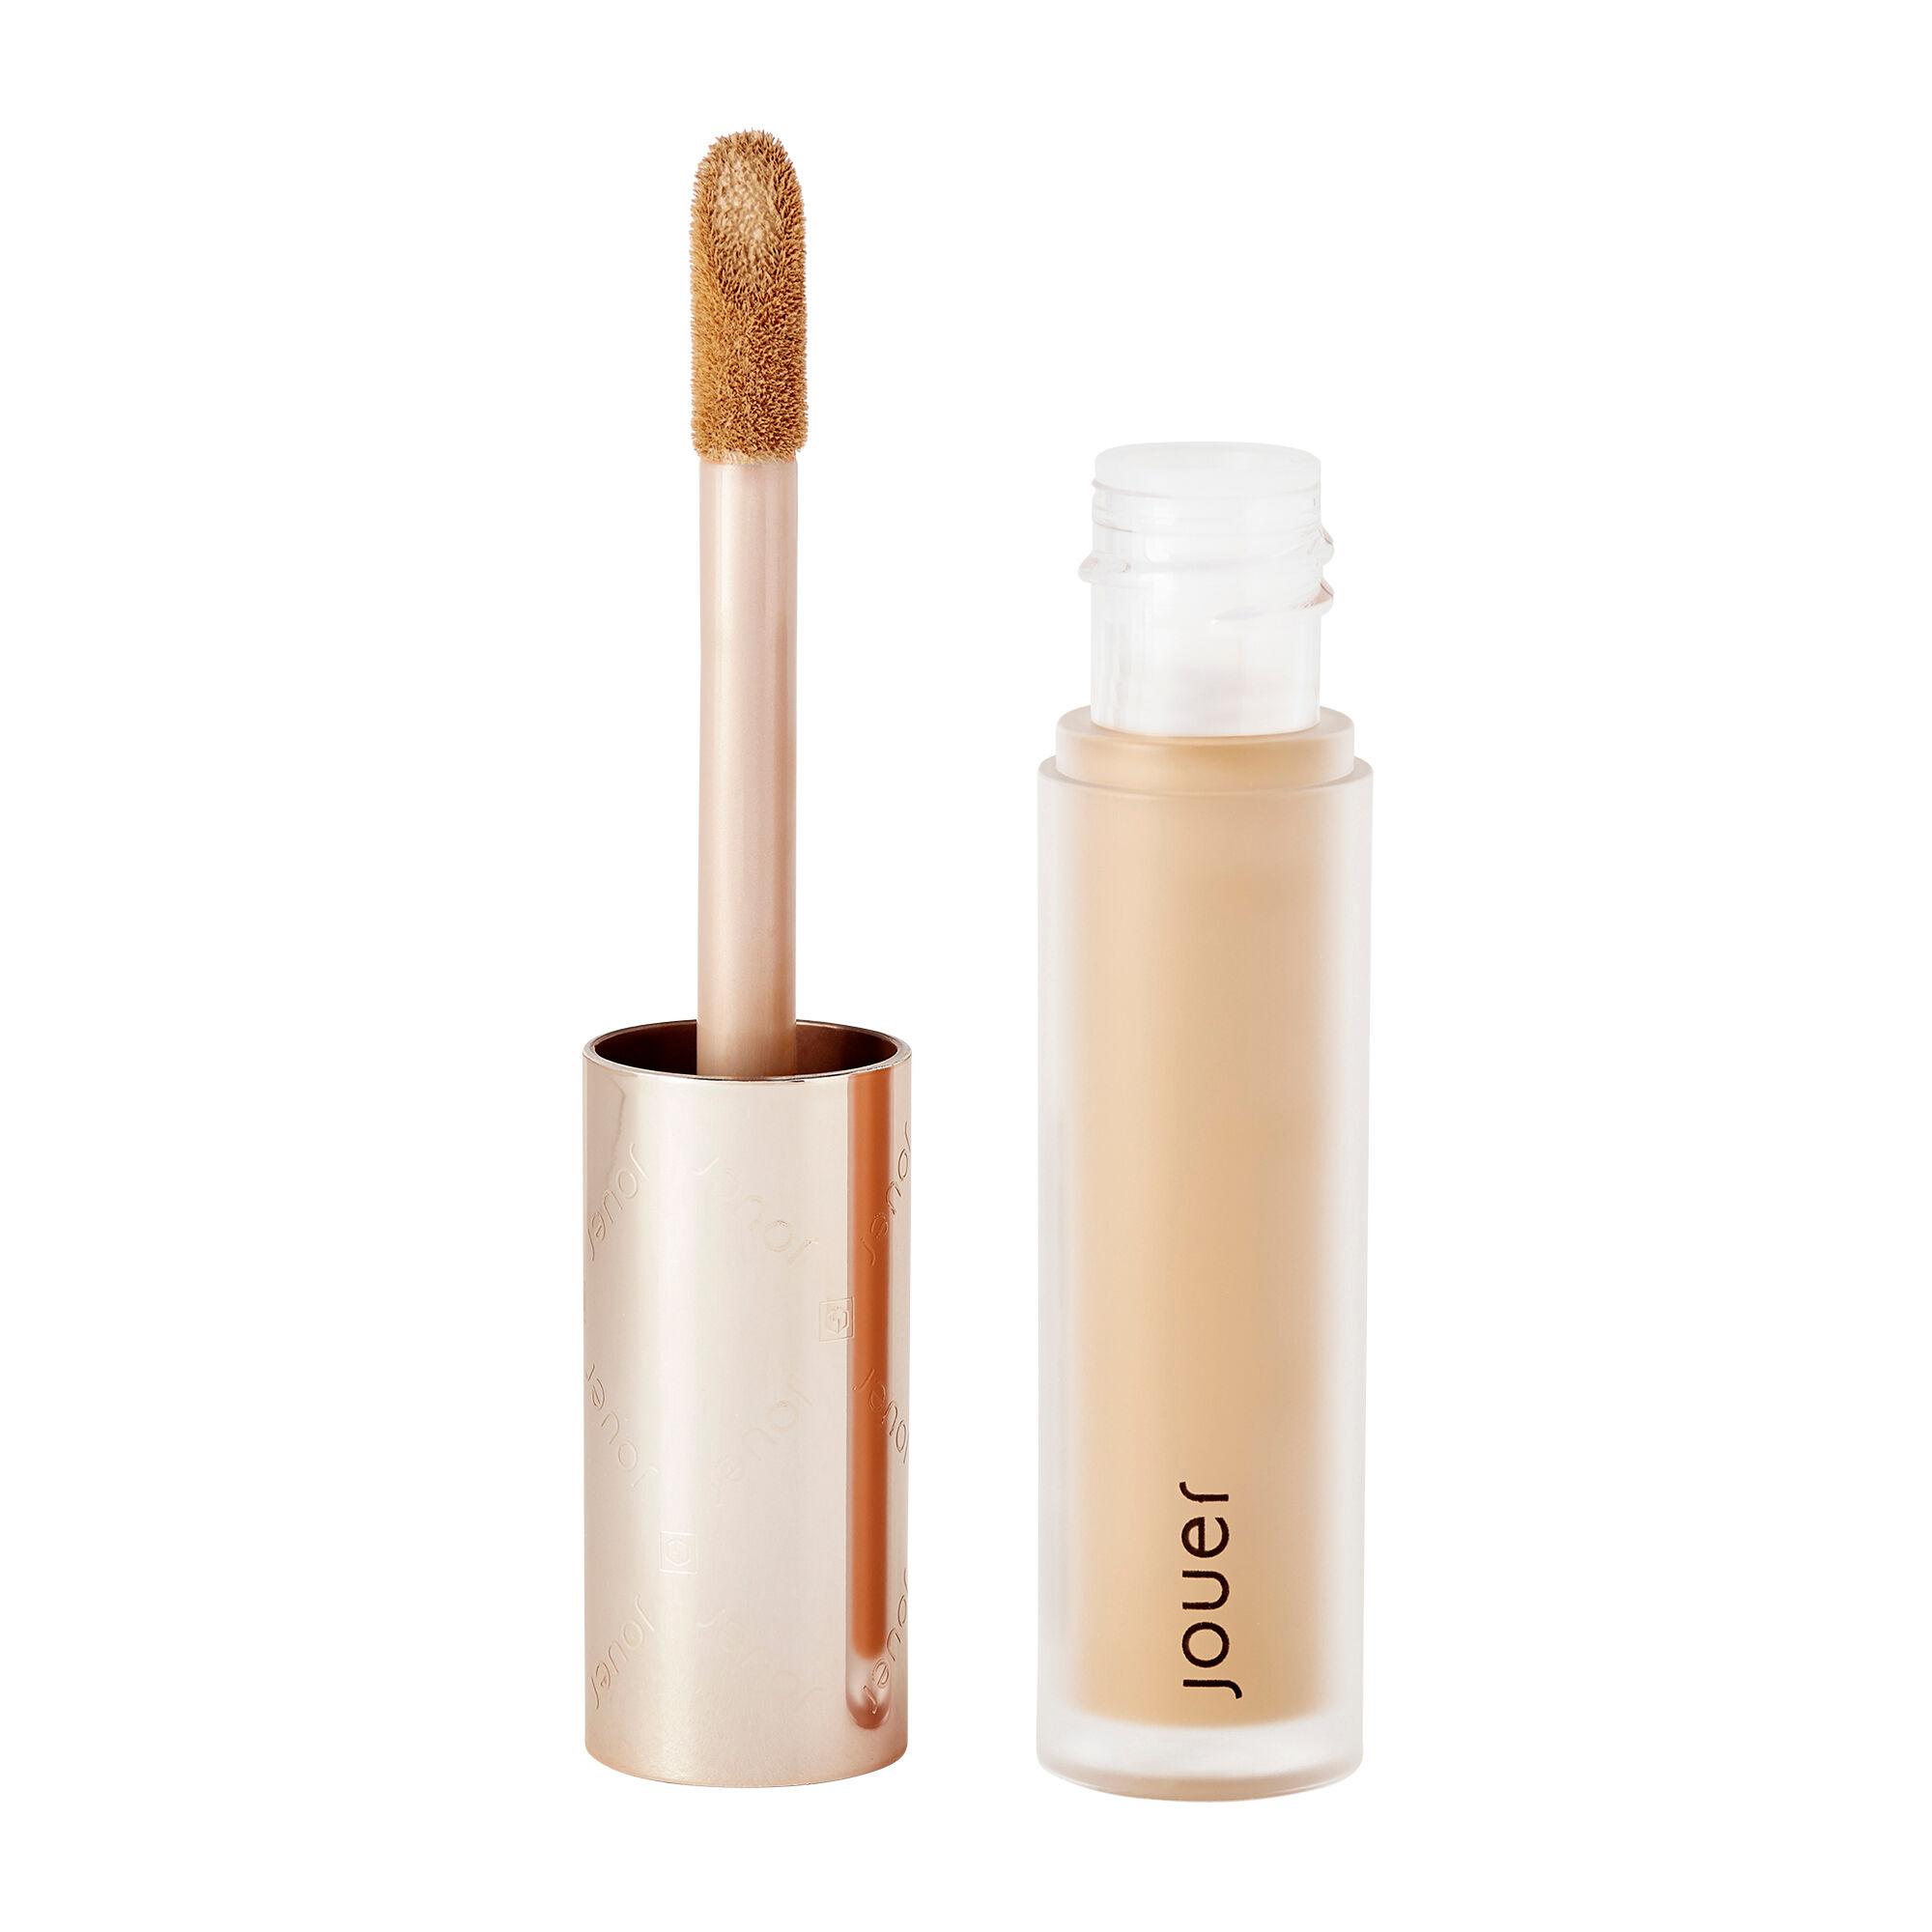 Jouer Cosmetics Essential High Coverage Liquid Concealer Rich Ginger 4.14ml